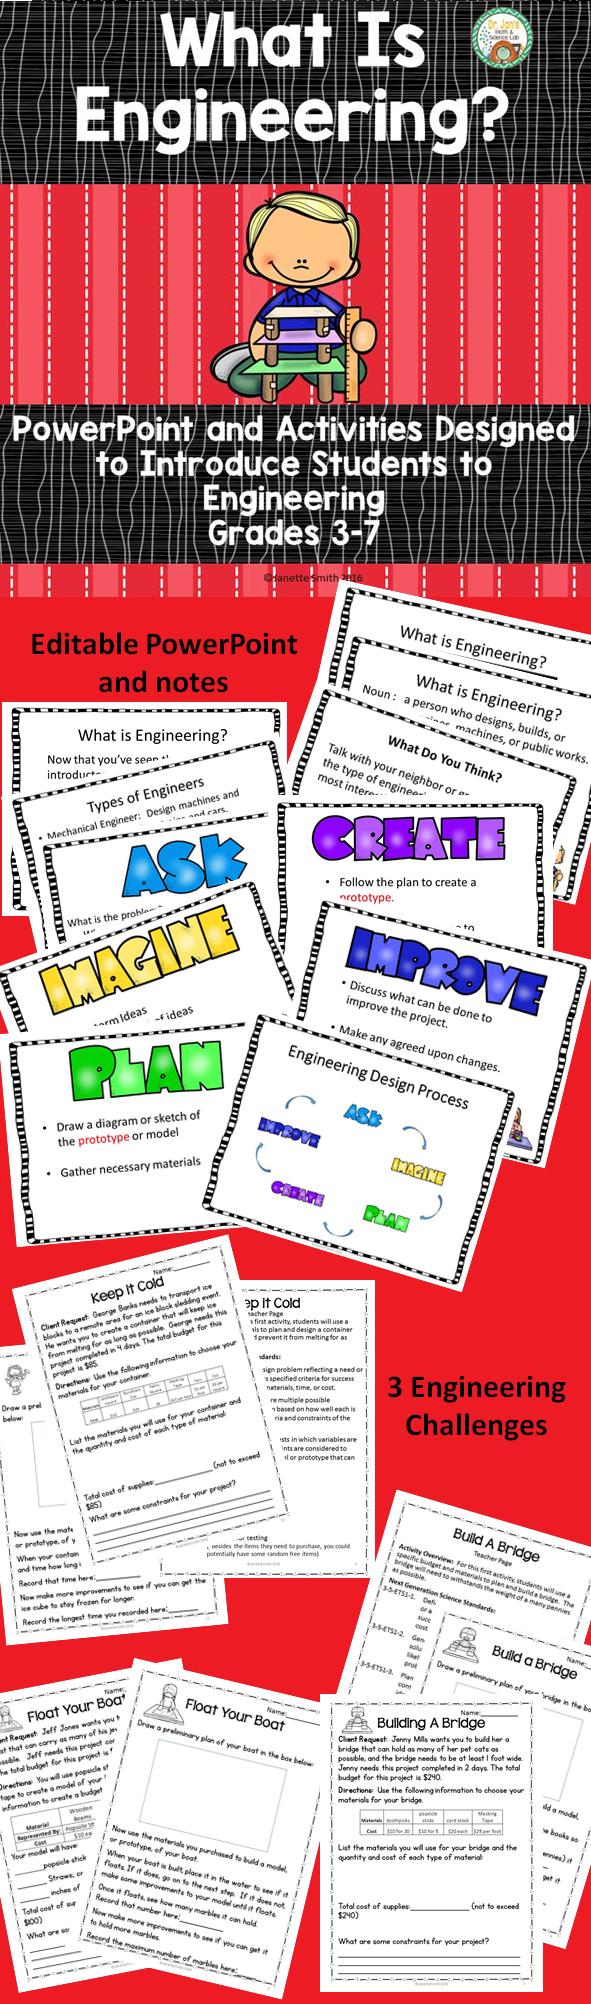 Engineering Design Process: PowerPoint and Activities